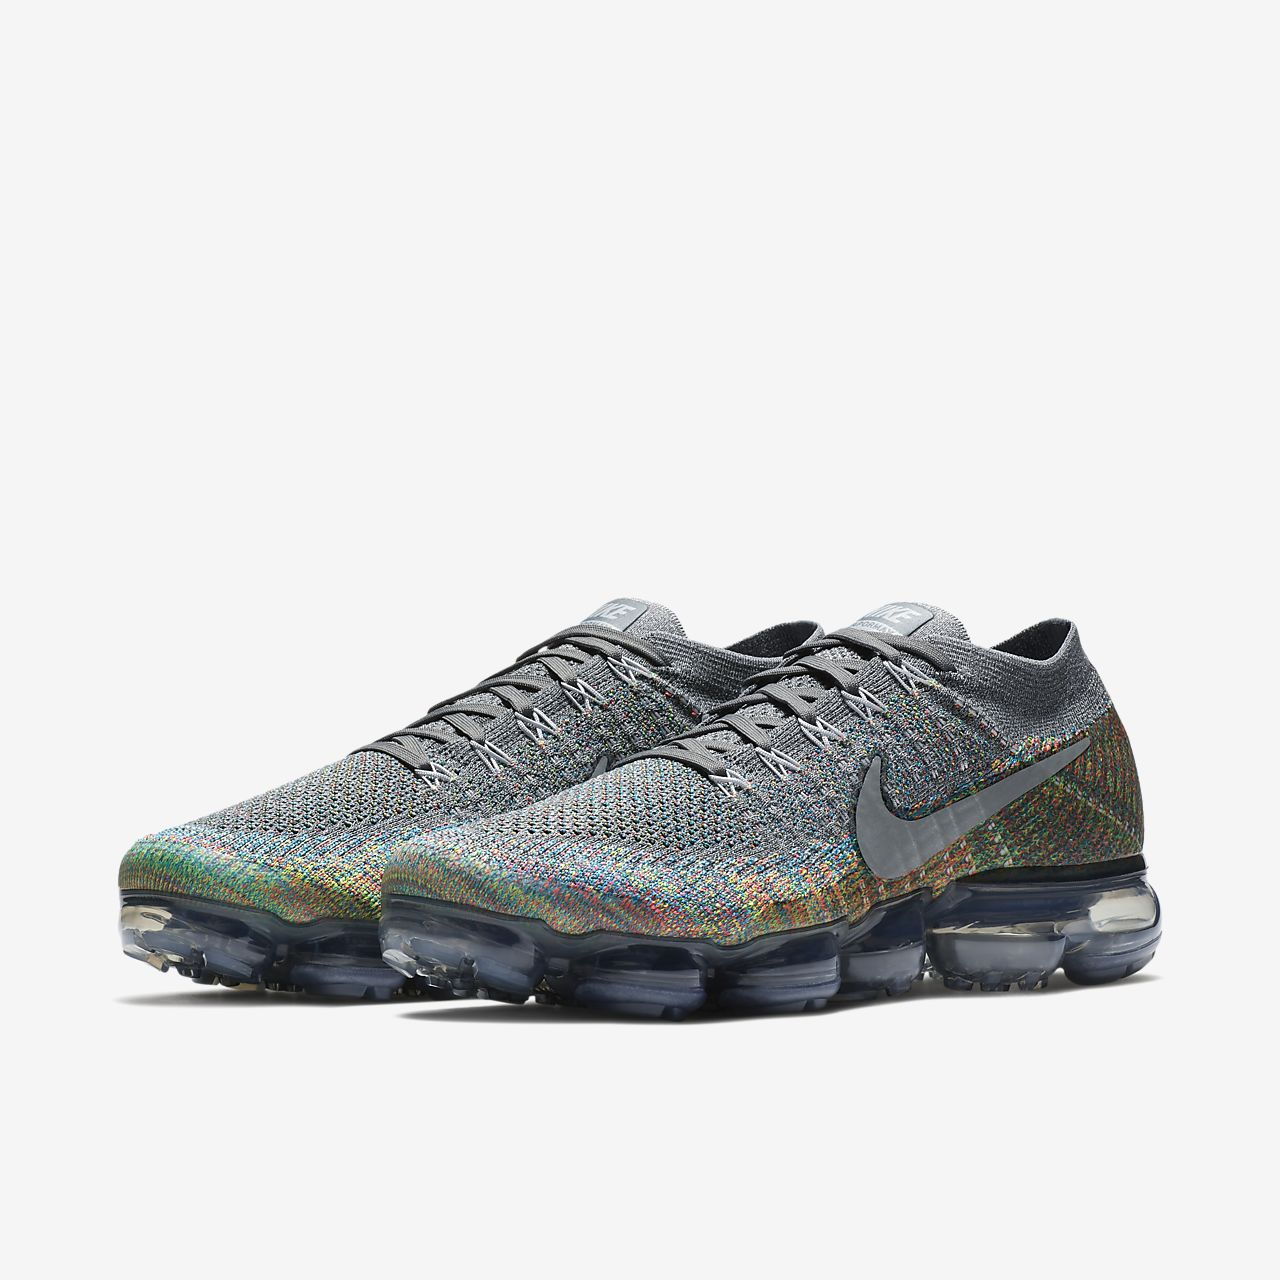 classic fit d83e4 d3aea ... Chaussure Nike Air VaporMax Flyknit pour Homme